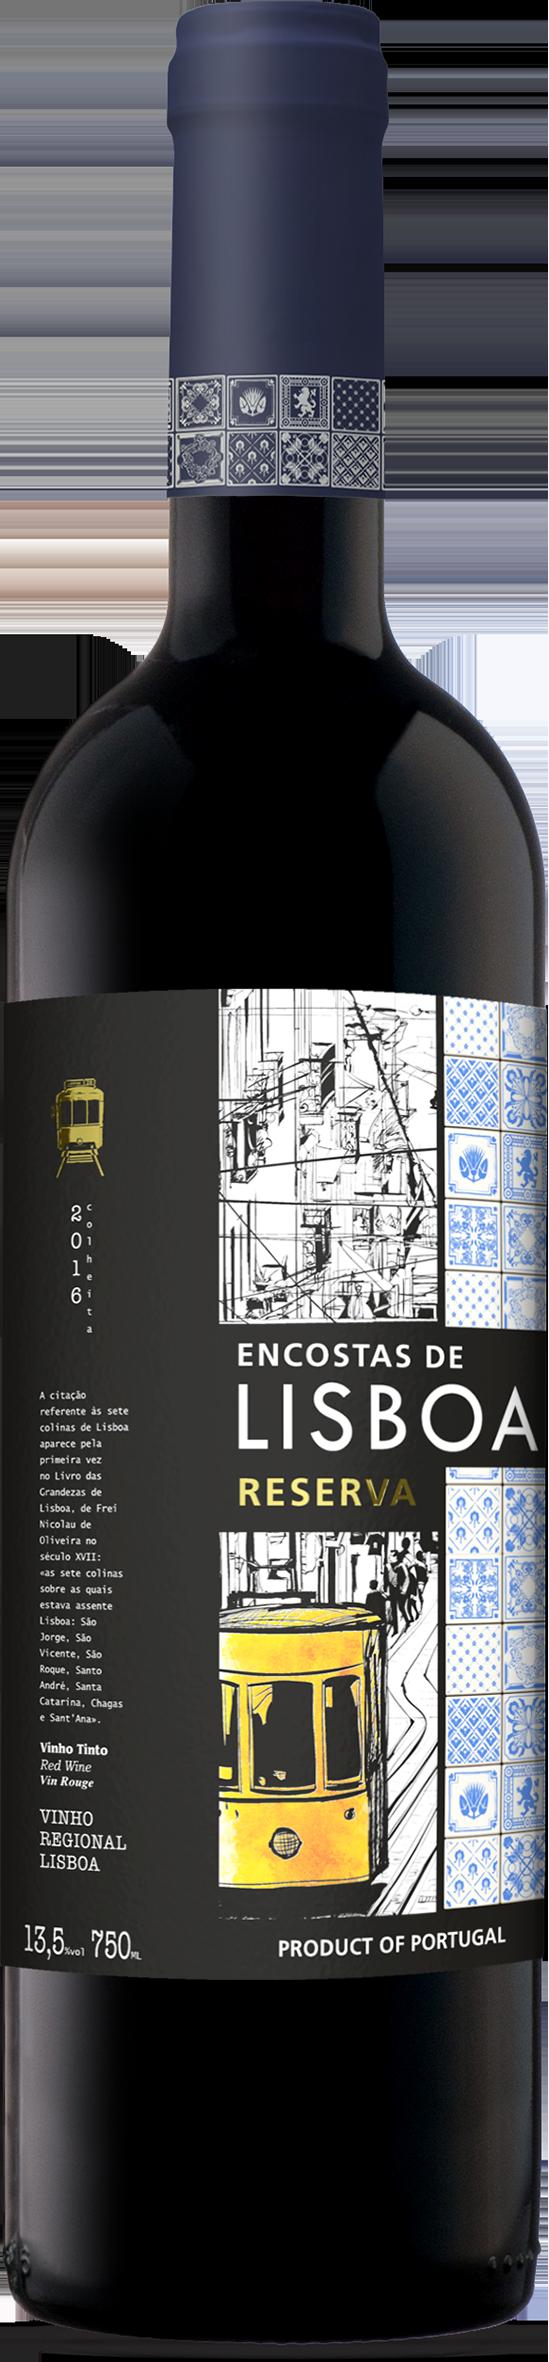 encostas-lisboa-reserva- image